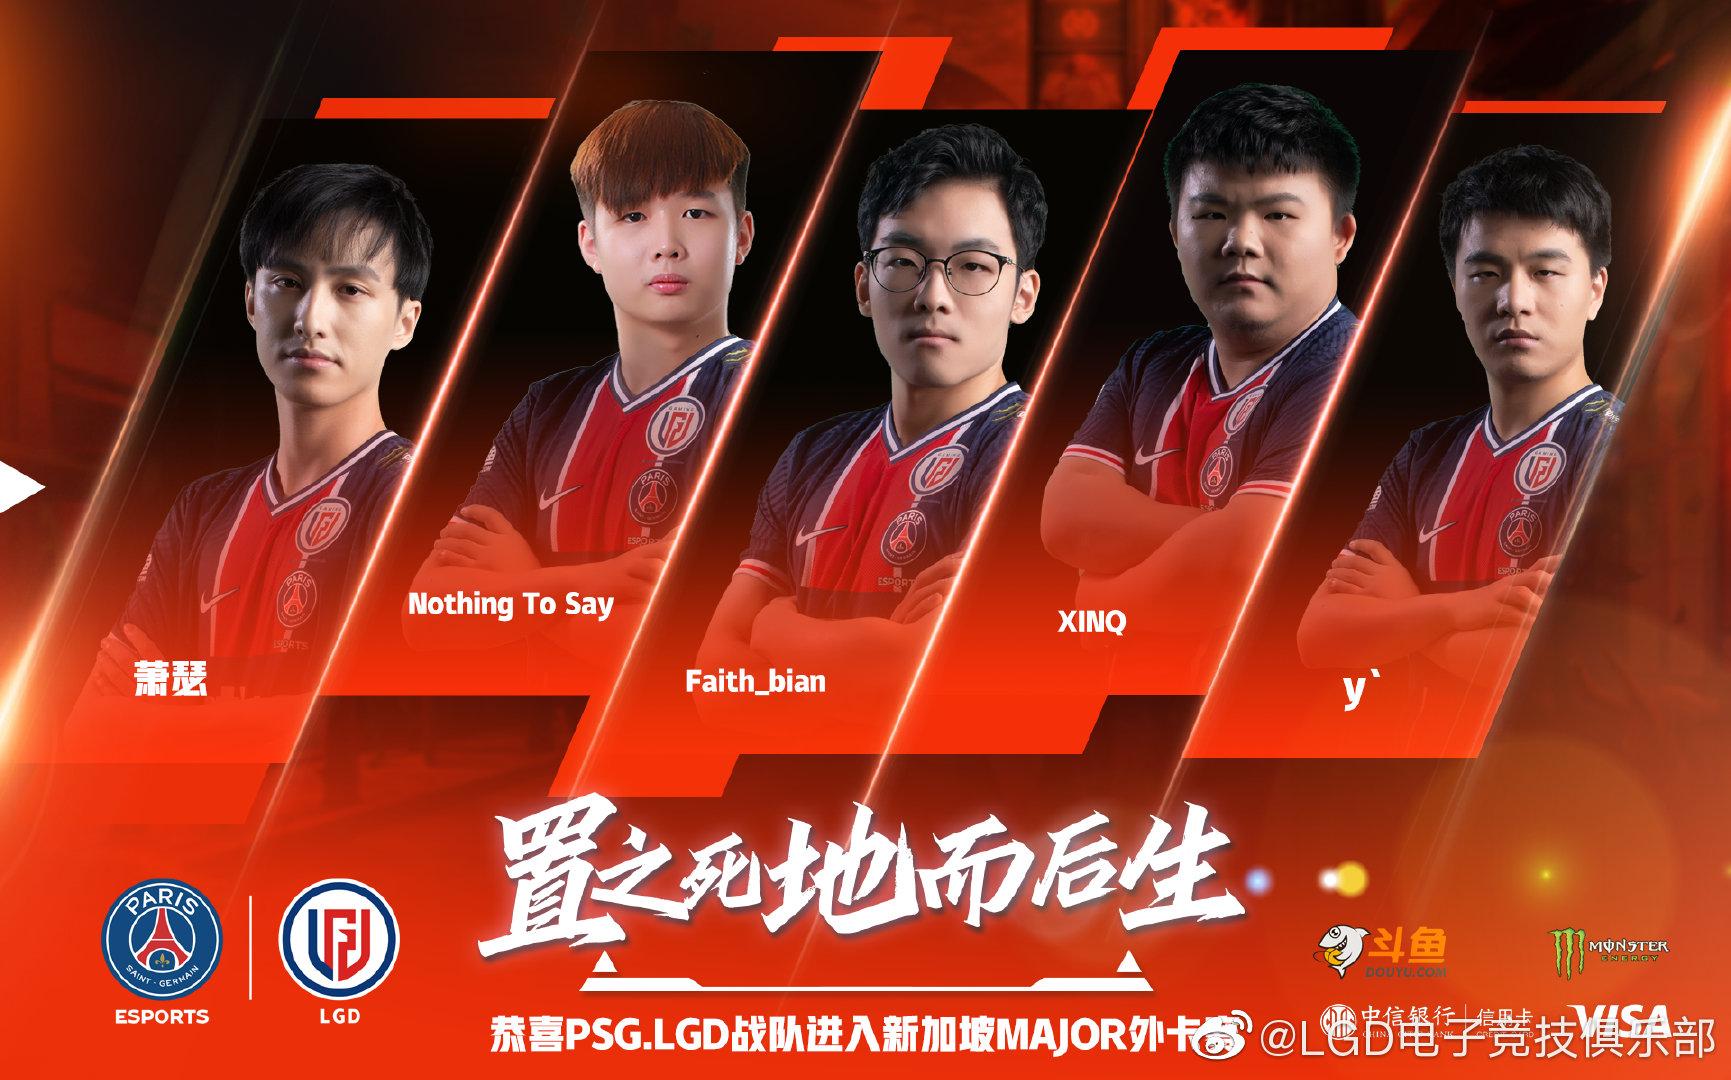 《DOTA2》DPC中国联赛 LGD 2:0小象晋级Major